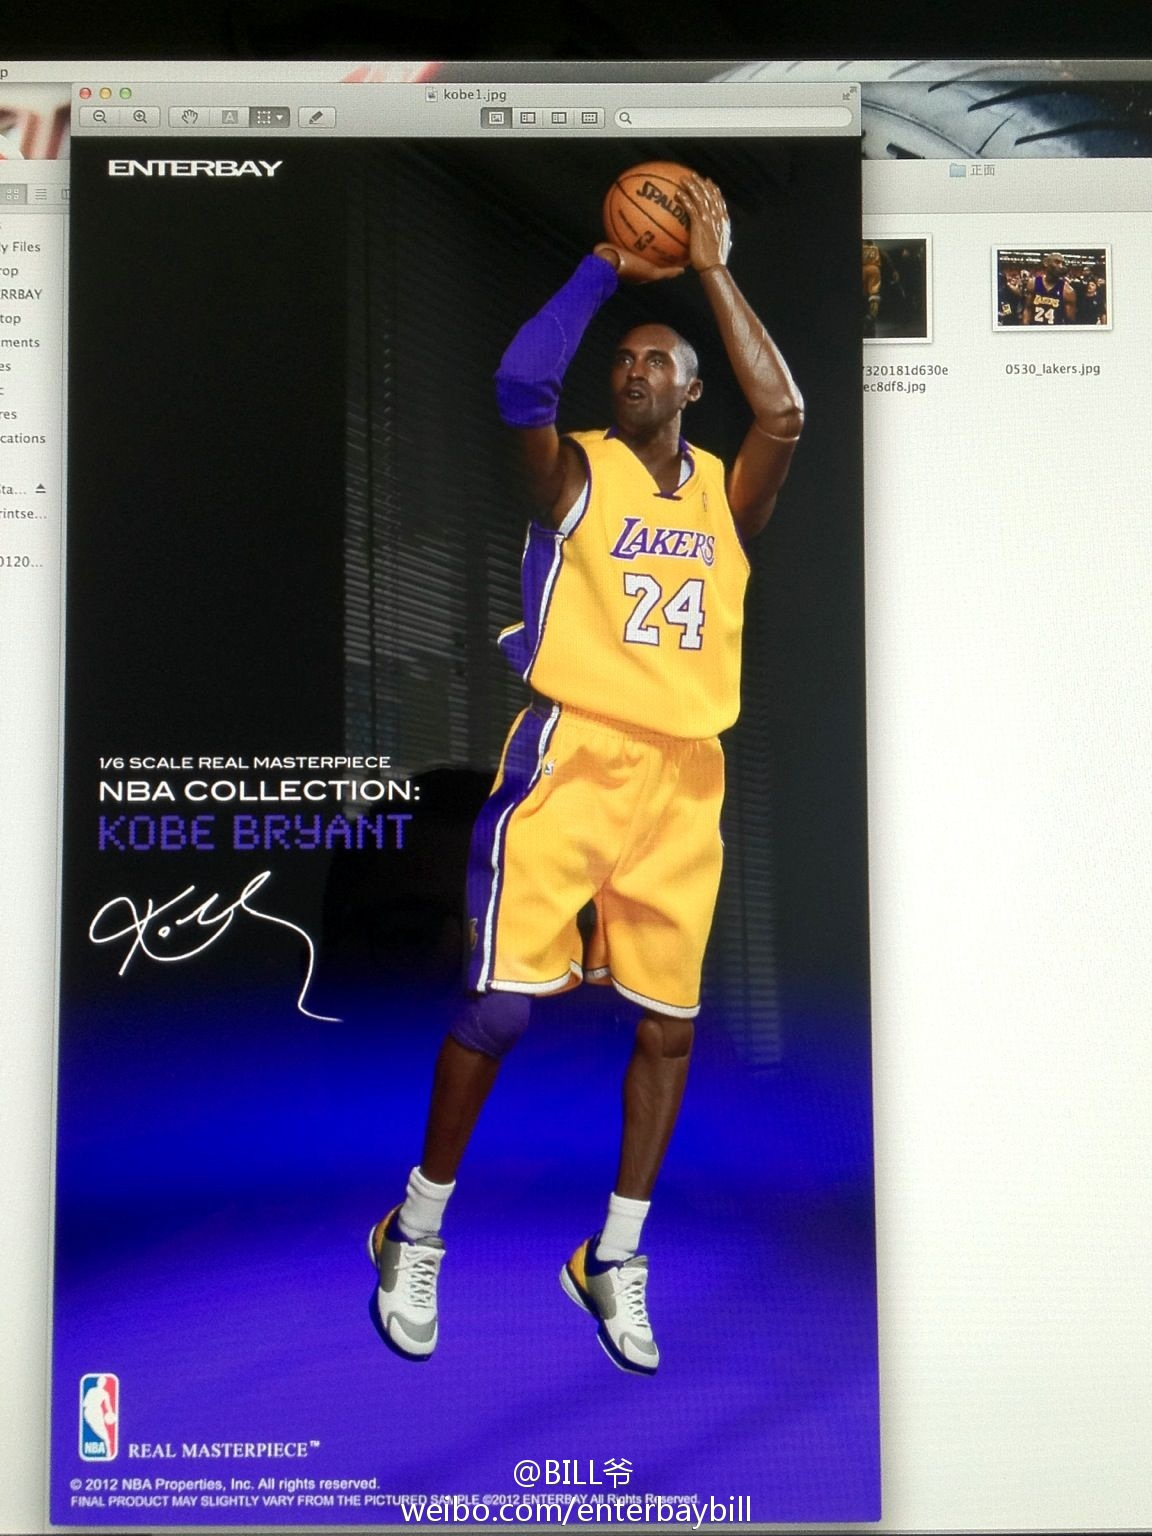 [ENTERBAY] NBA Real Masterpiece - Kobe Bryant!!! - Página 3 69464edejw1dvacnu5wkaj